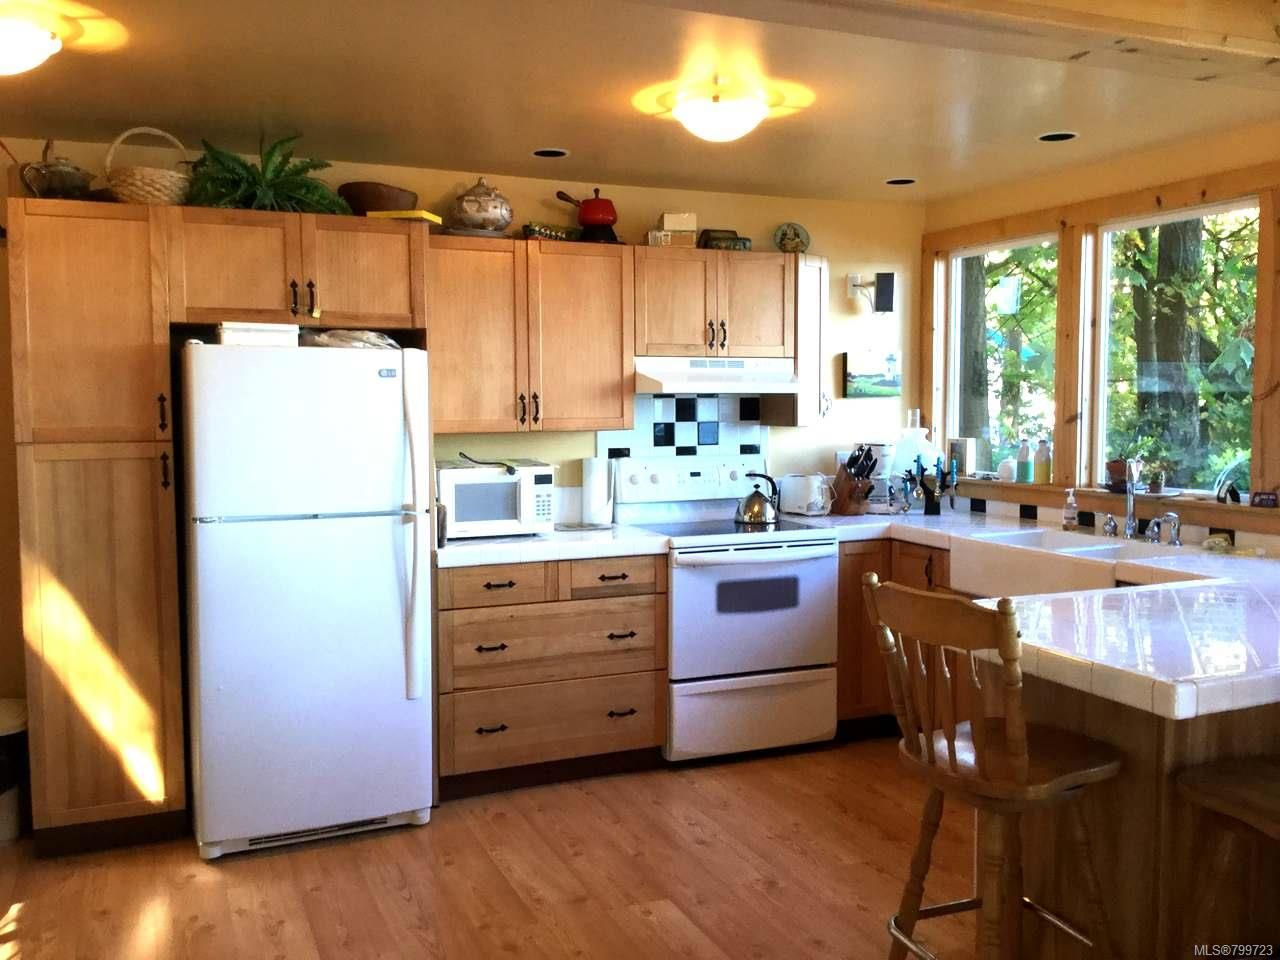 Photo 3: Photos: 1058 Sea Fern Lane in MUDGE ISLAND: Isl Mudge Island House for sale (Islands)  : MLS®# 799723